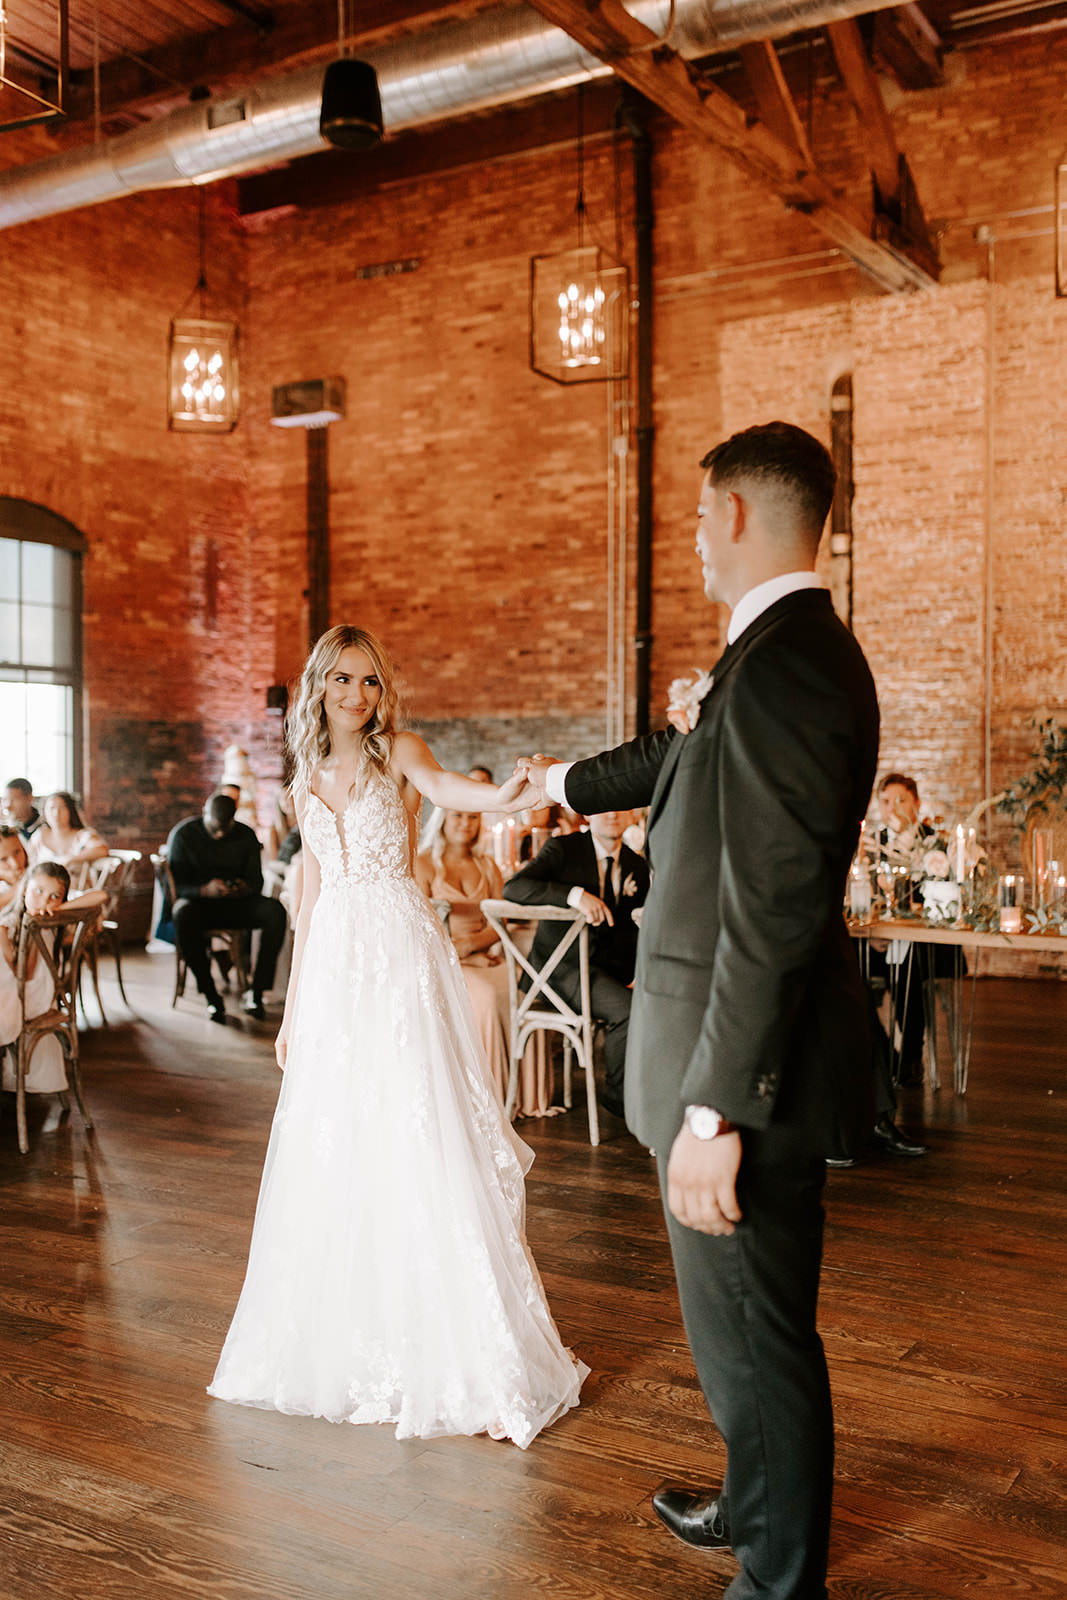 Romantic Boho Chic Bride and Groom First Dance Wedding Reception Portrait   Tampa Bay Wedding Industrial Venue Armature Works